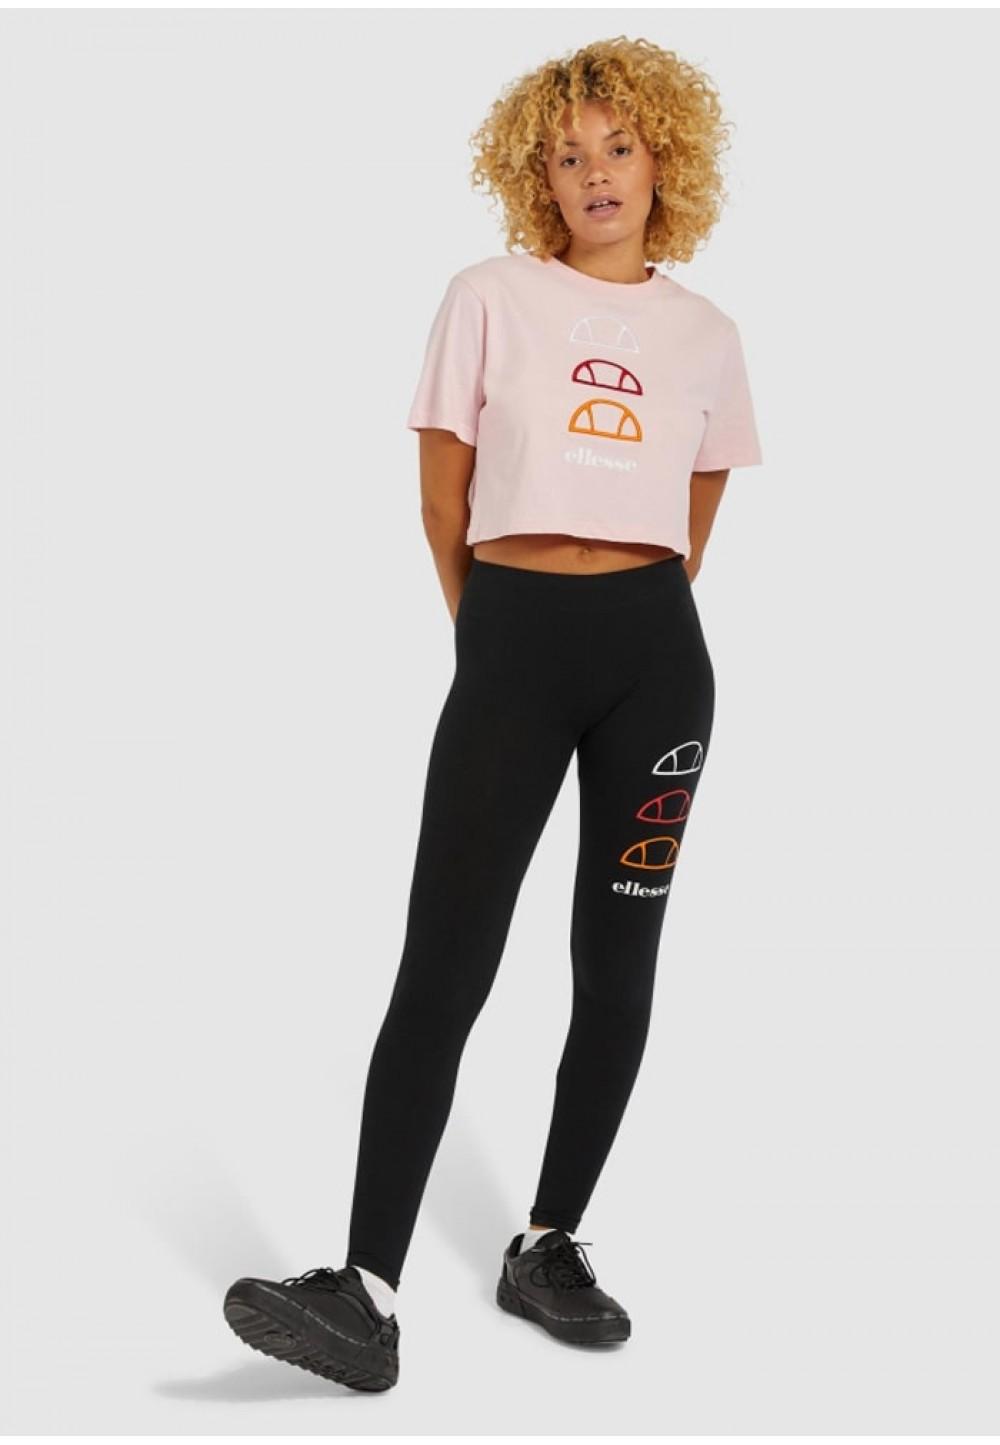 Светло-розовая футболка-топ